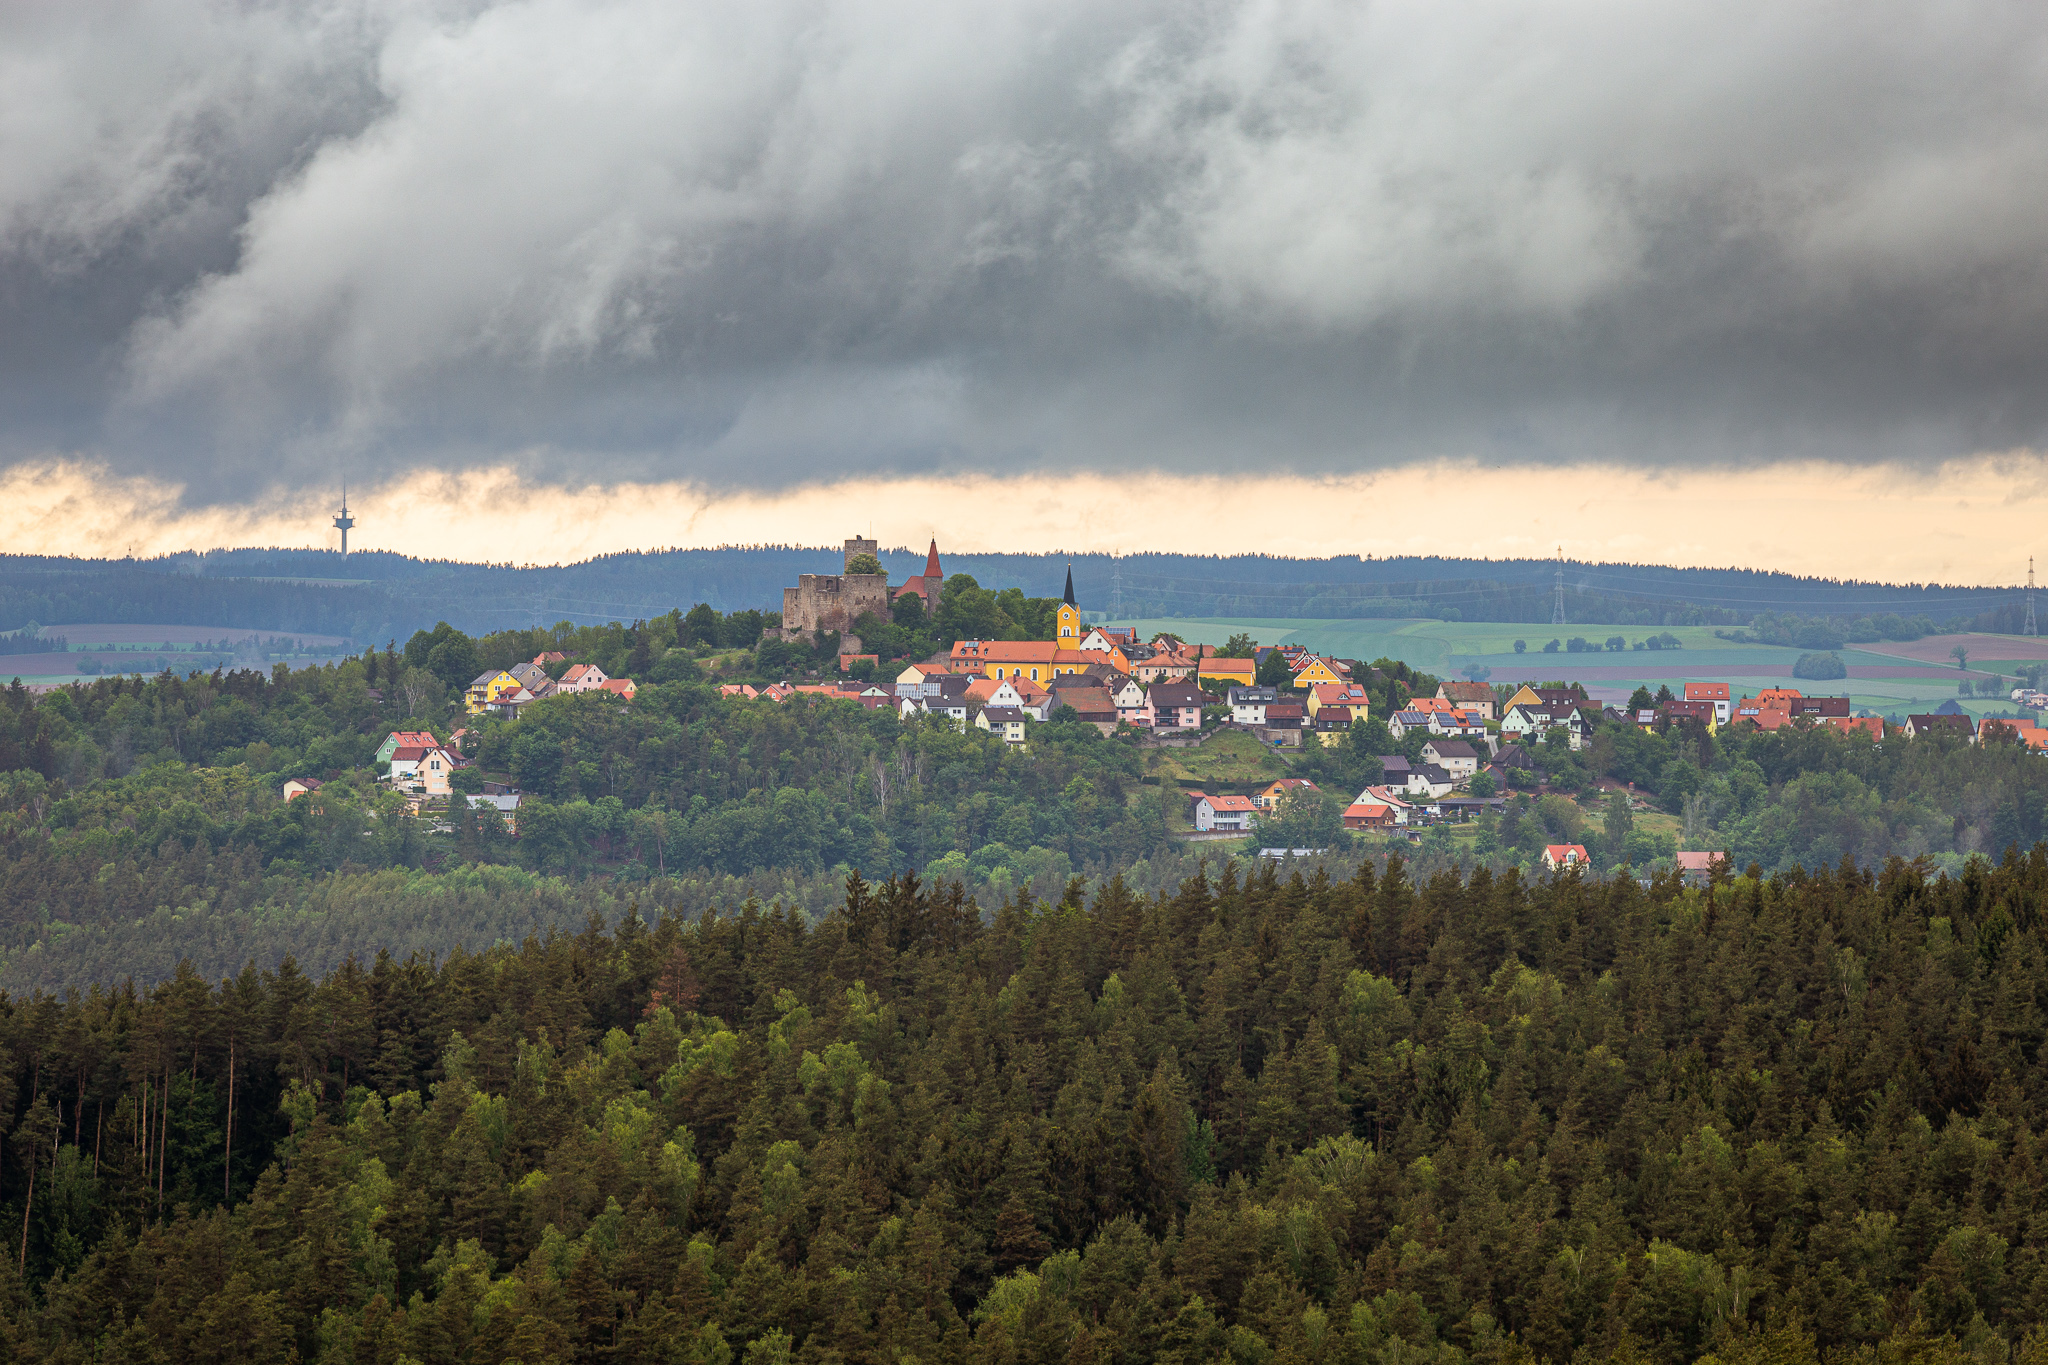 Wittschau, Germany